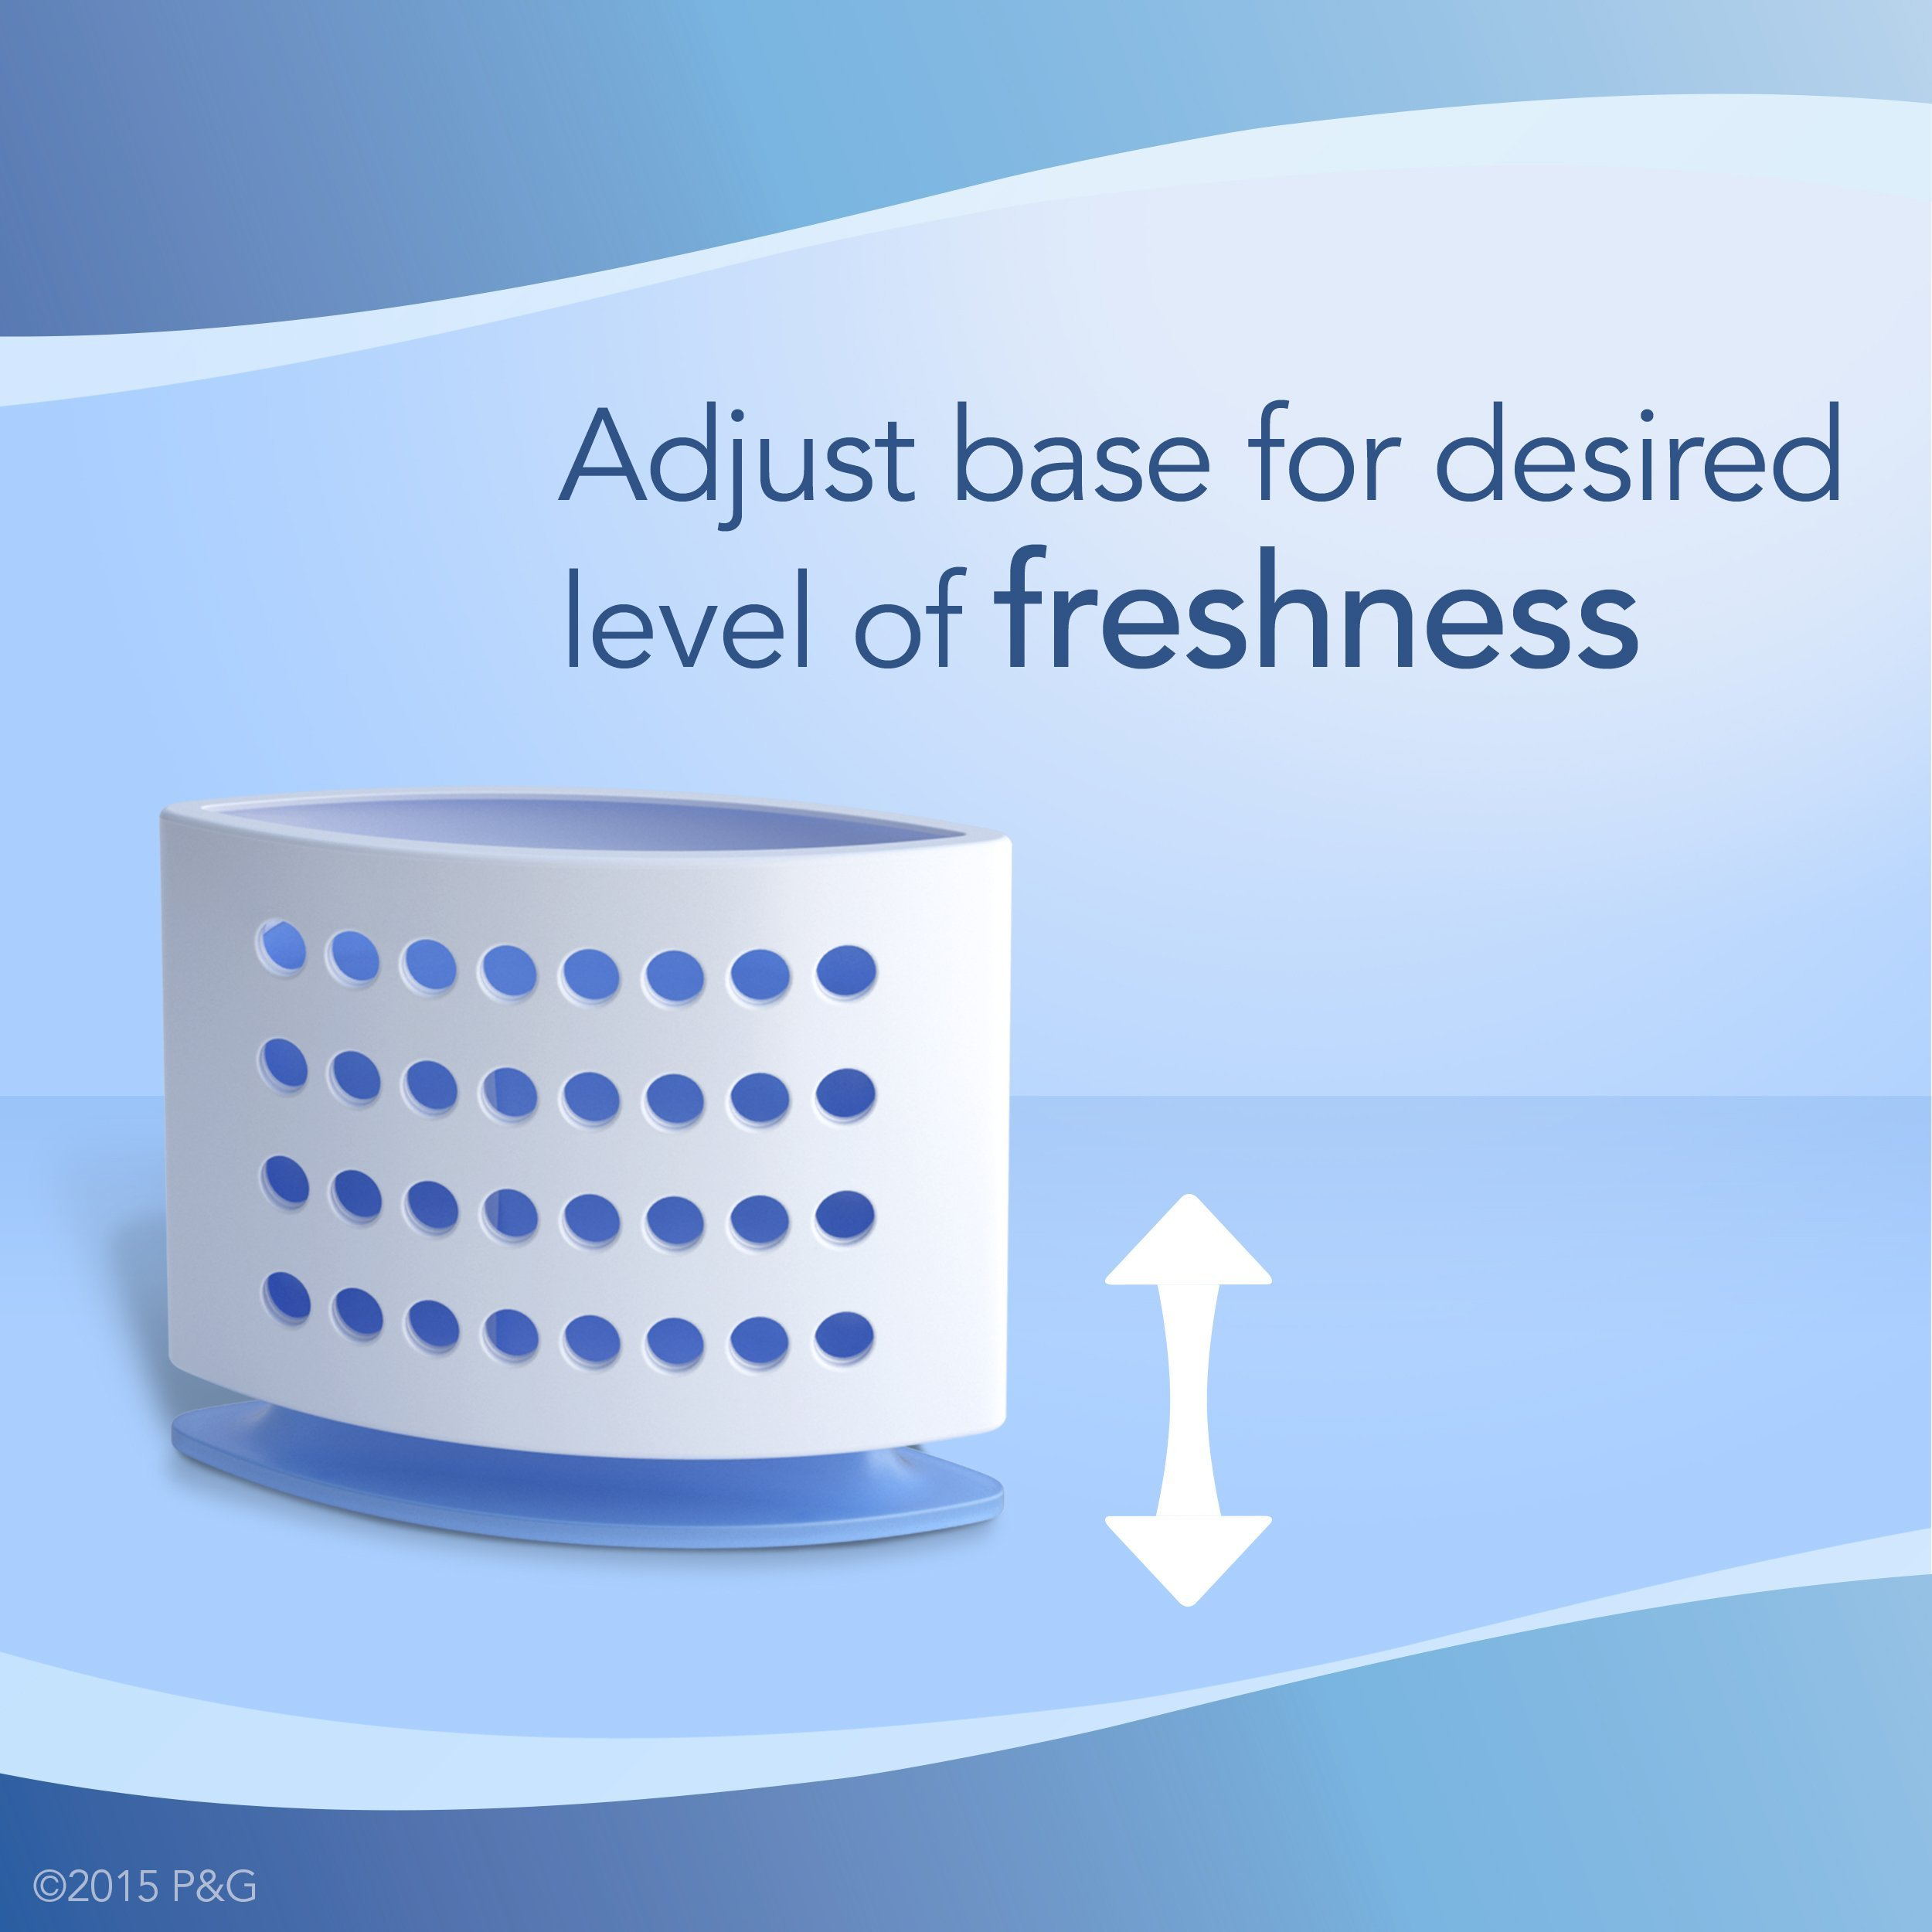 Febreze Air Freshener,  Small Spaces Air Freshener,  with Gain Original Starter Kit Air Freshener 5.5 mL(Pack of 8) by Febreze (Image #7)